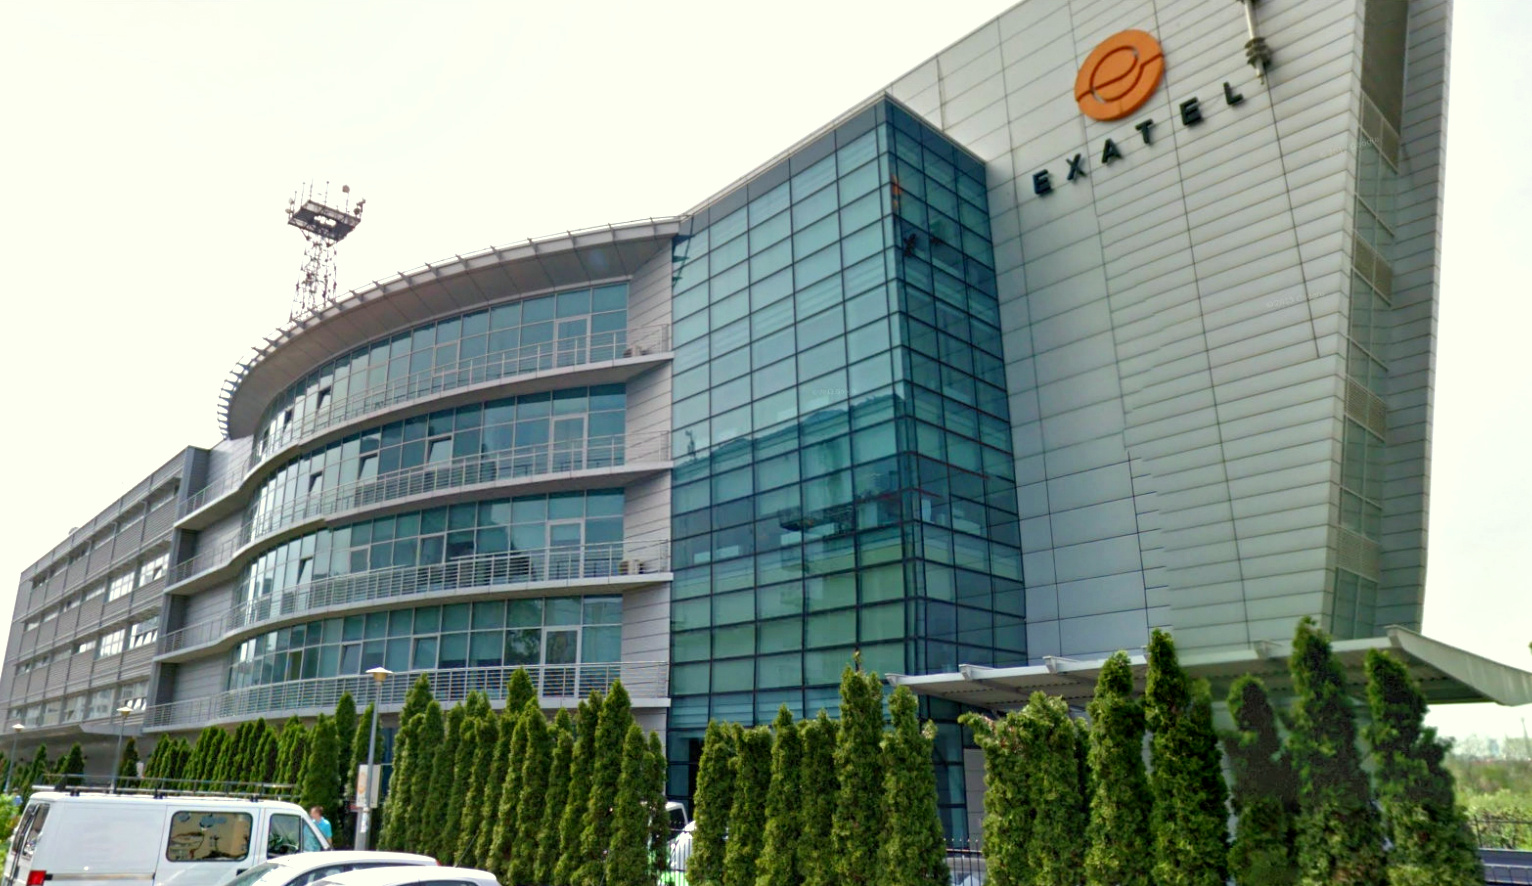 Biurowiec EXATEL HQ